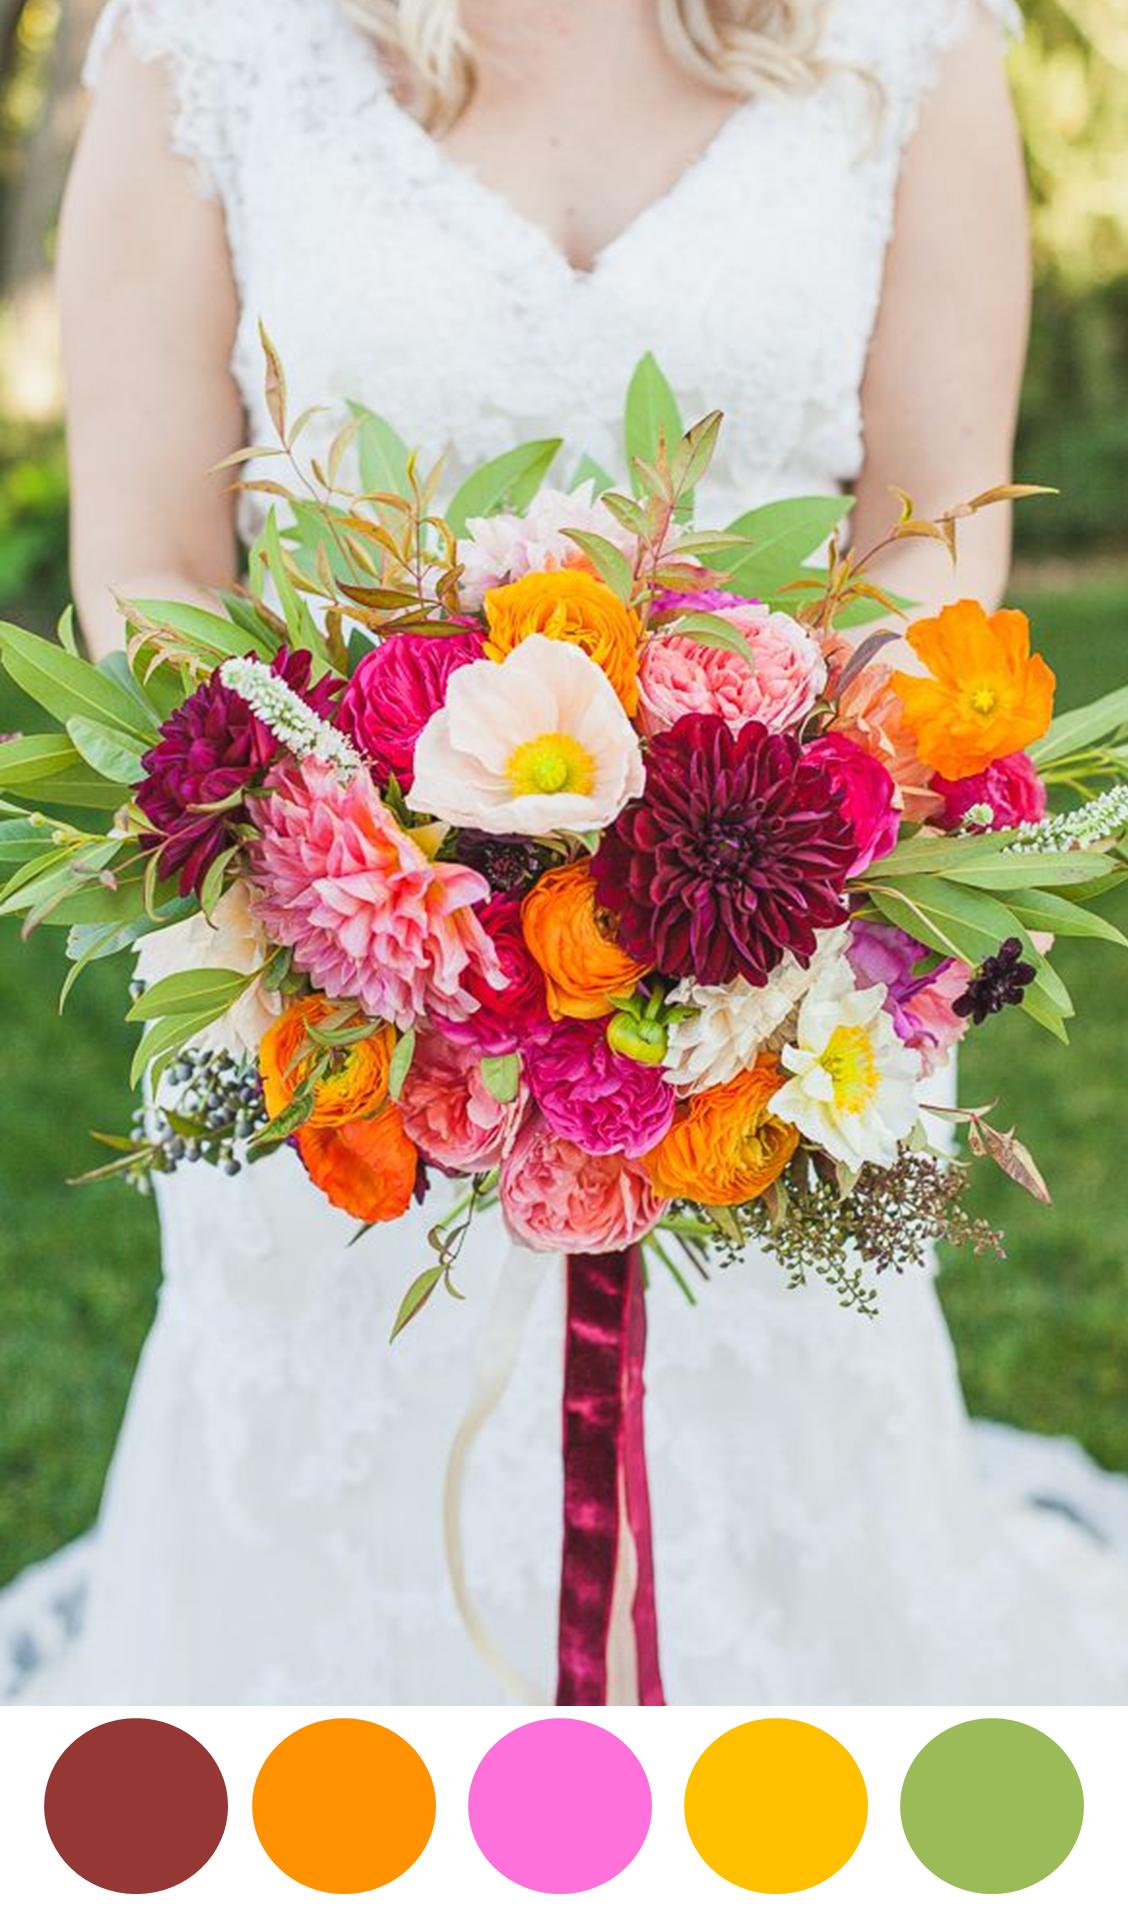 10 colorful bouquets for your wedding day brautstr u e. Black Bedroom Furniture Sets. Home Design Ideas